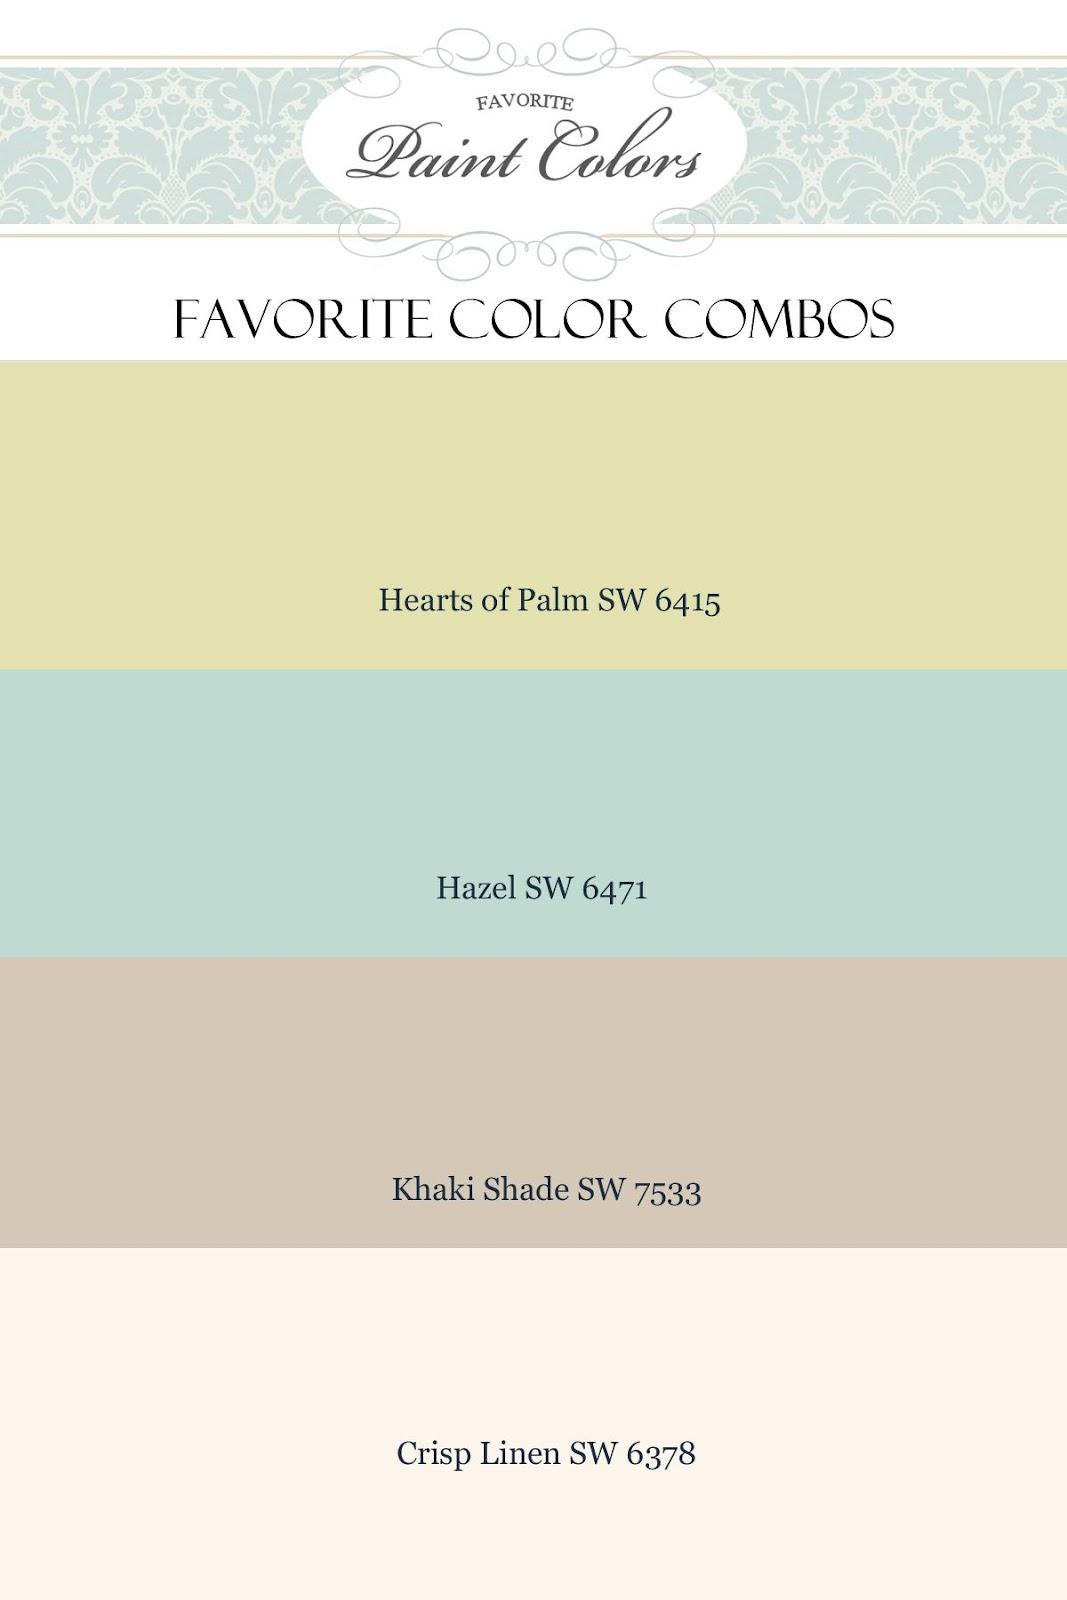 Favorite Paint Colors February 2012